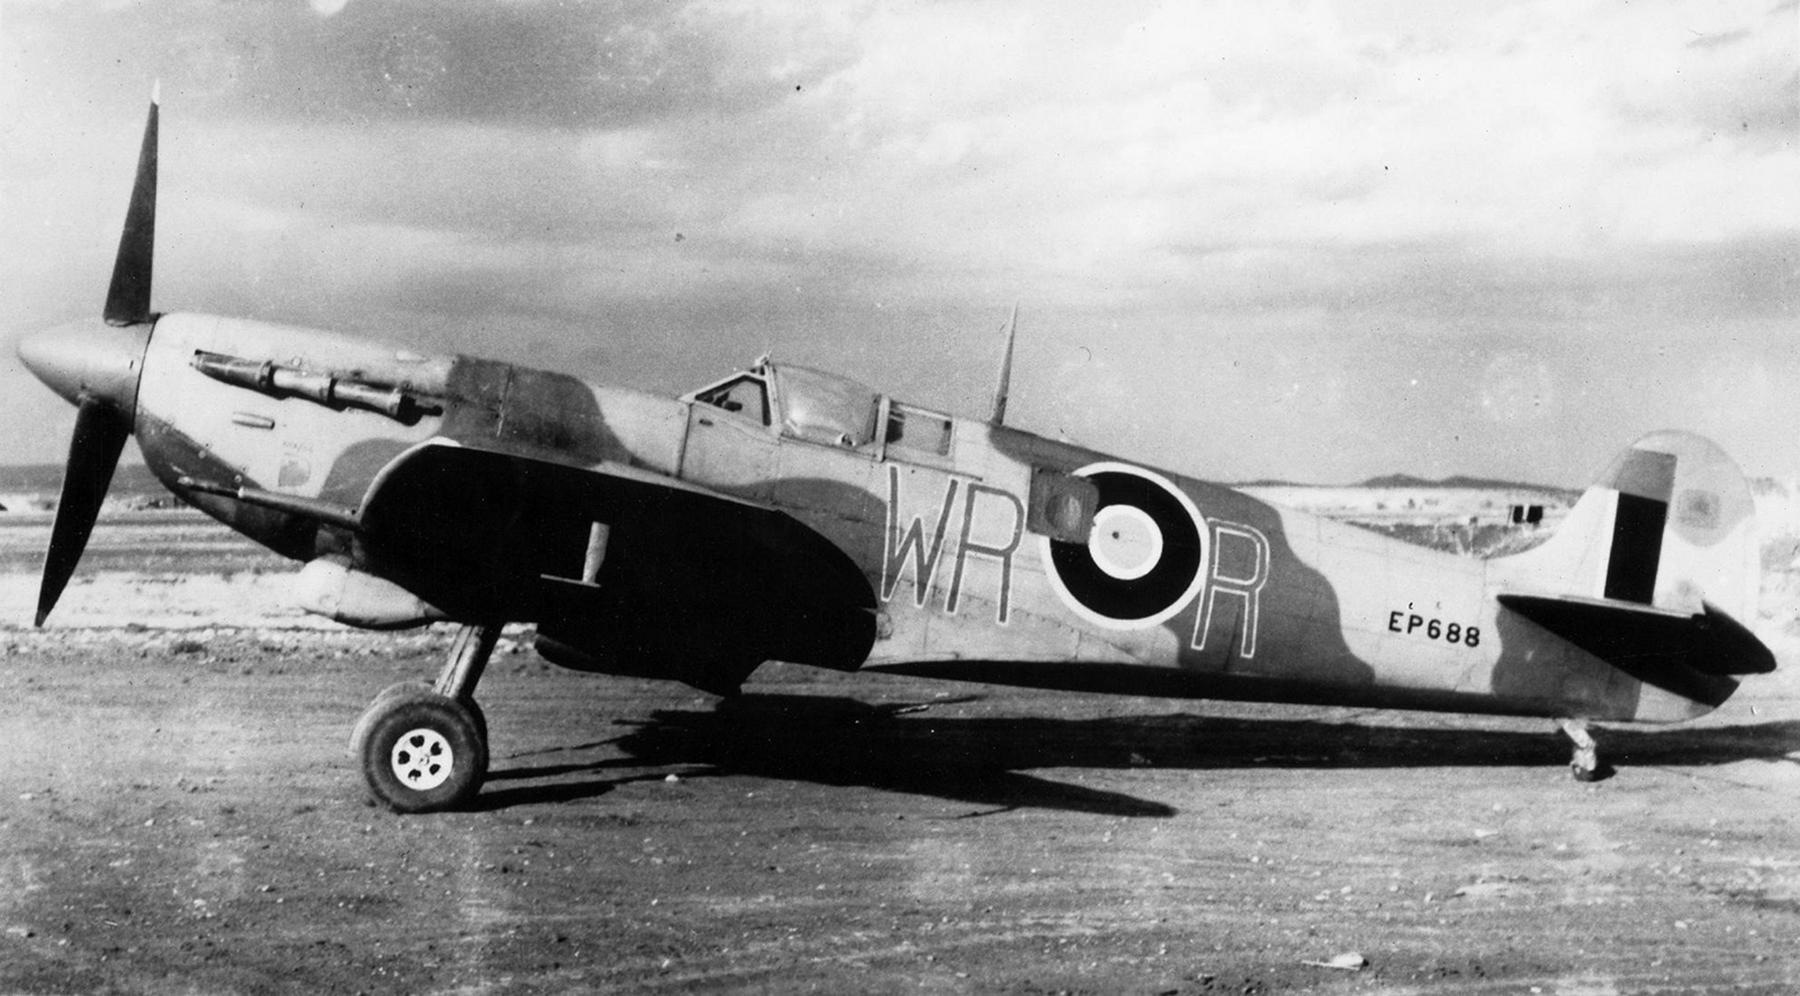 Spitfire LFVb SAAF 40Sqn WRR Aboukir filter F24 camera EP688 Sicily 1943 066